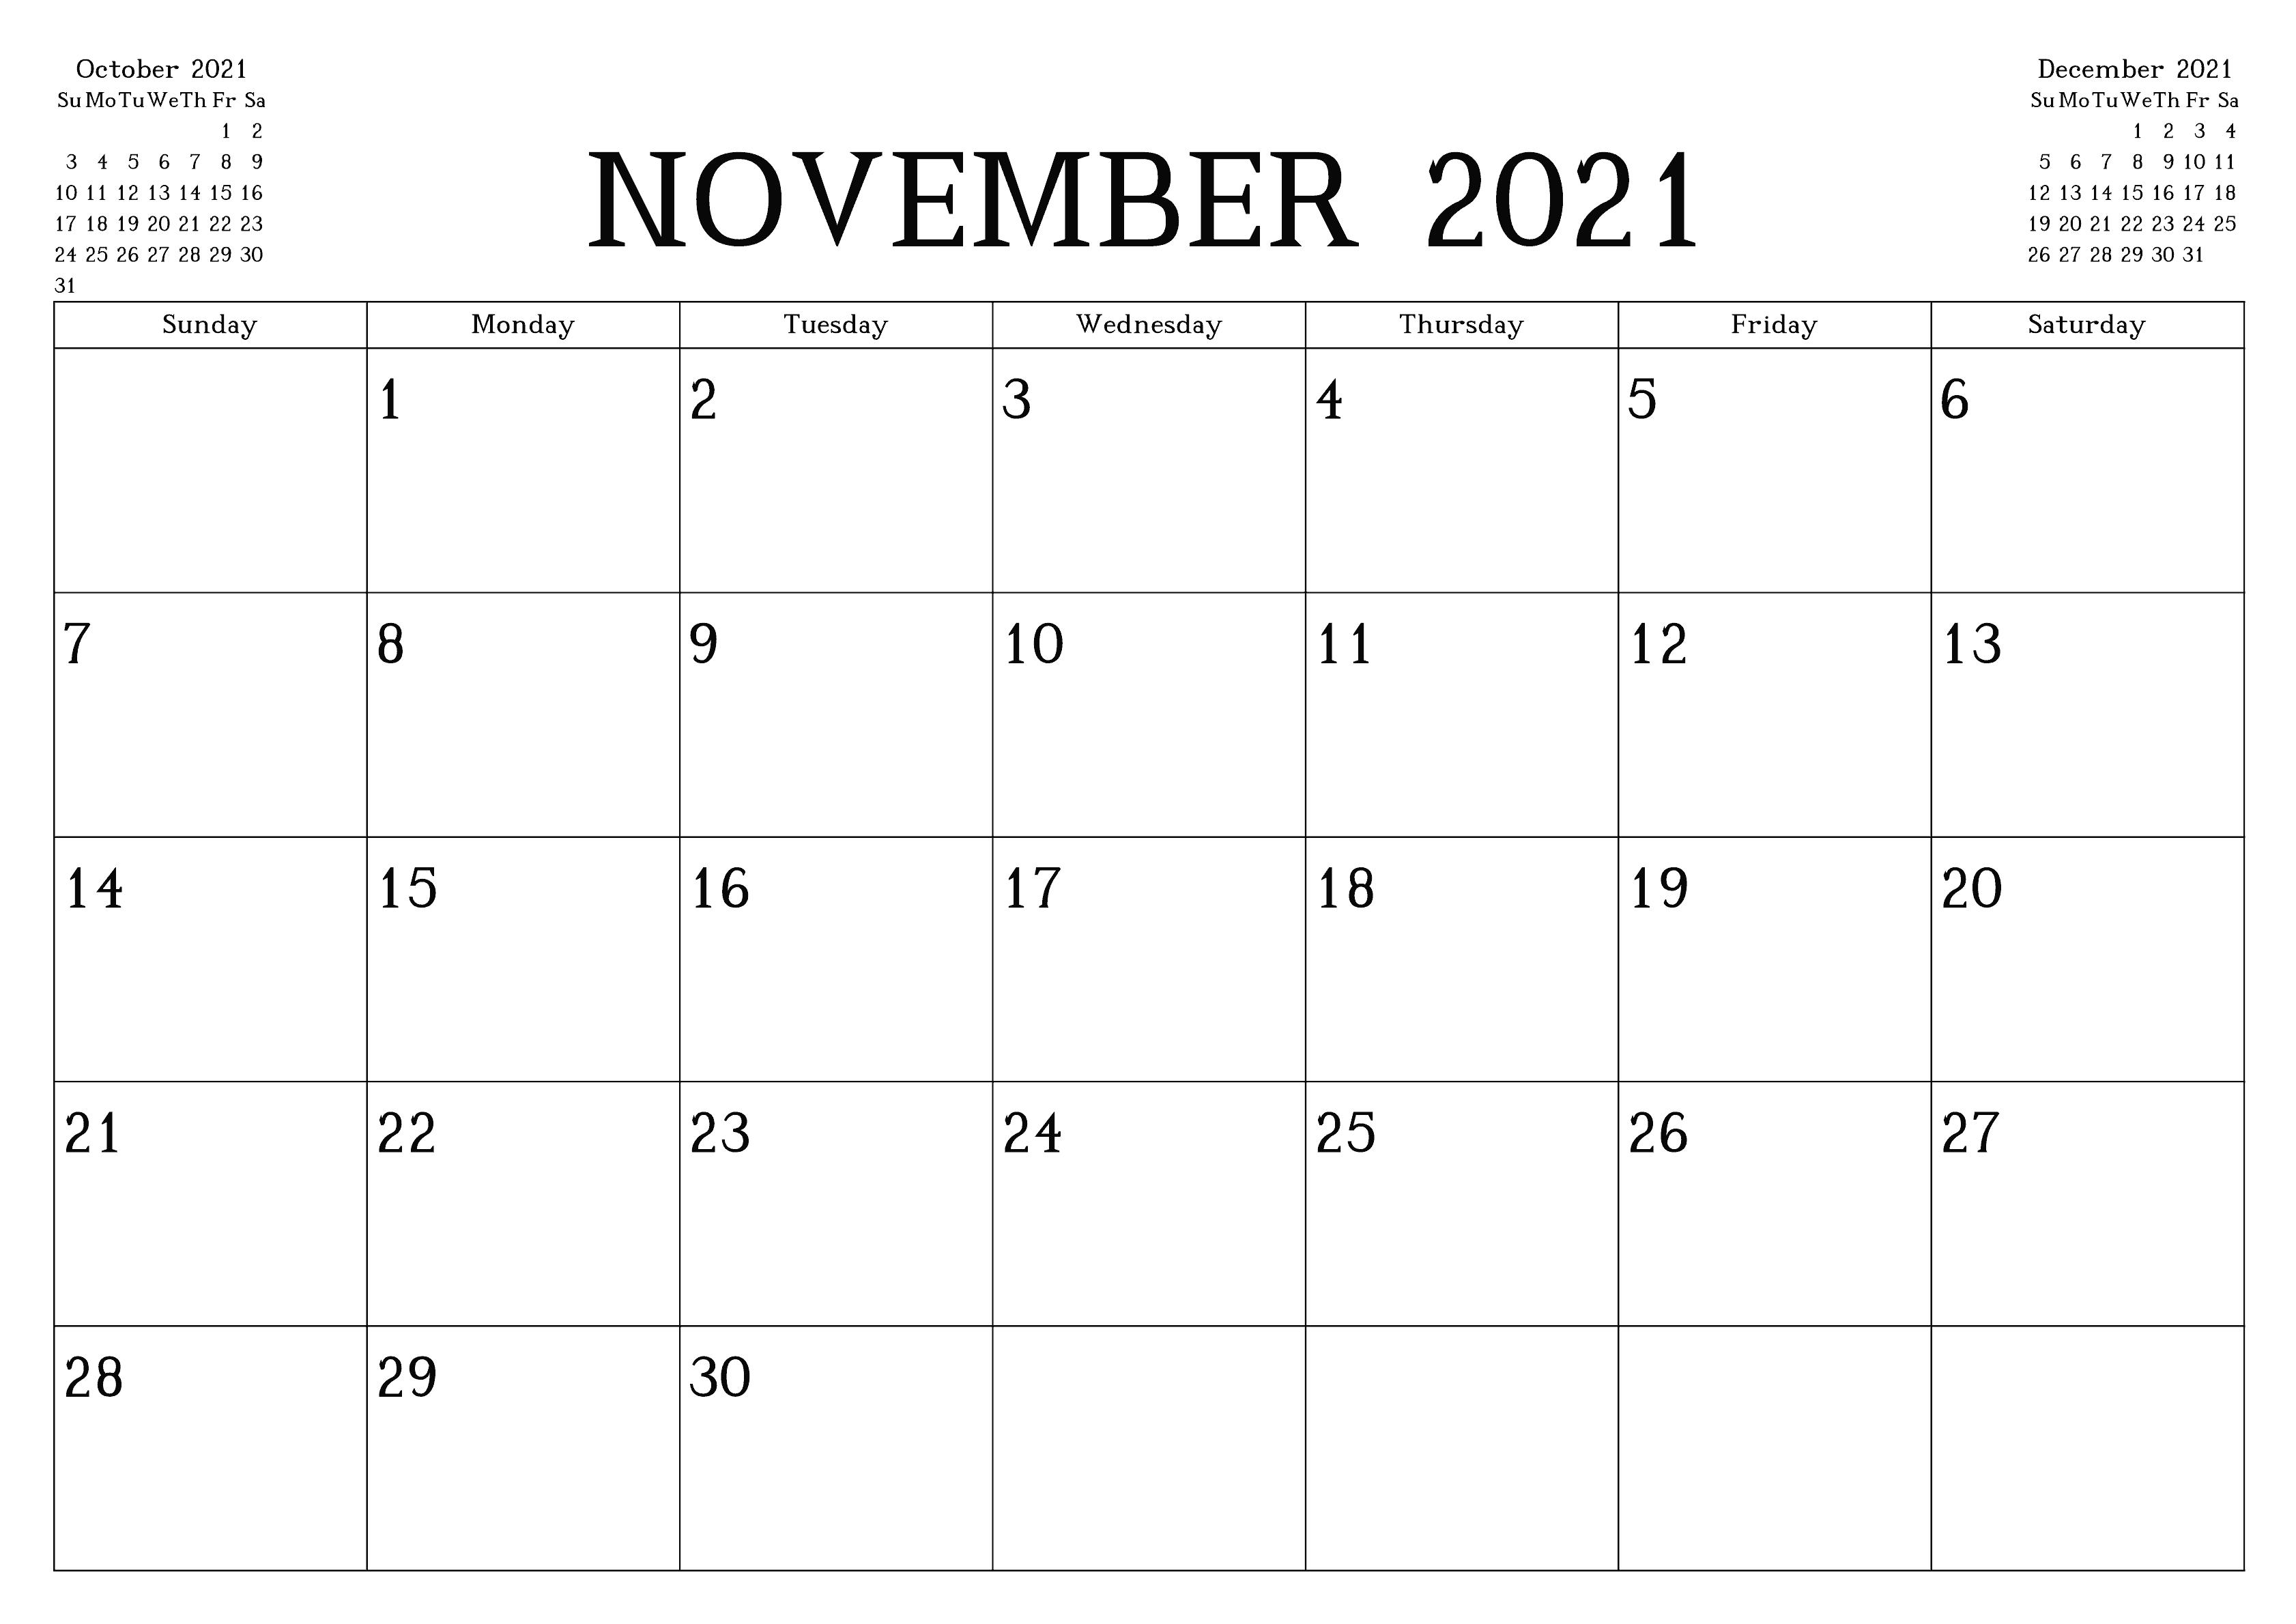 November 2021 Calendar Blank Large Squares